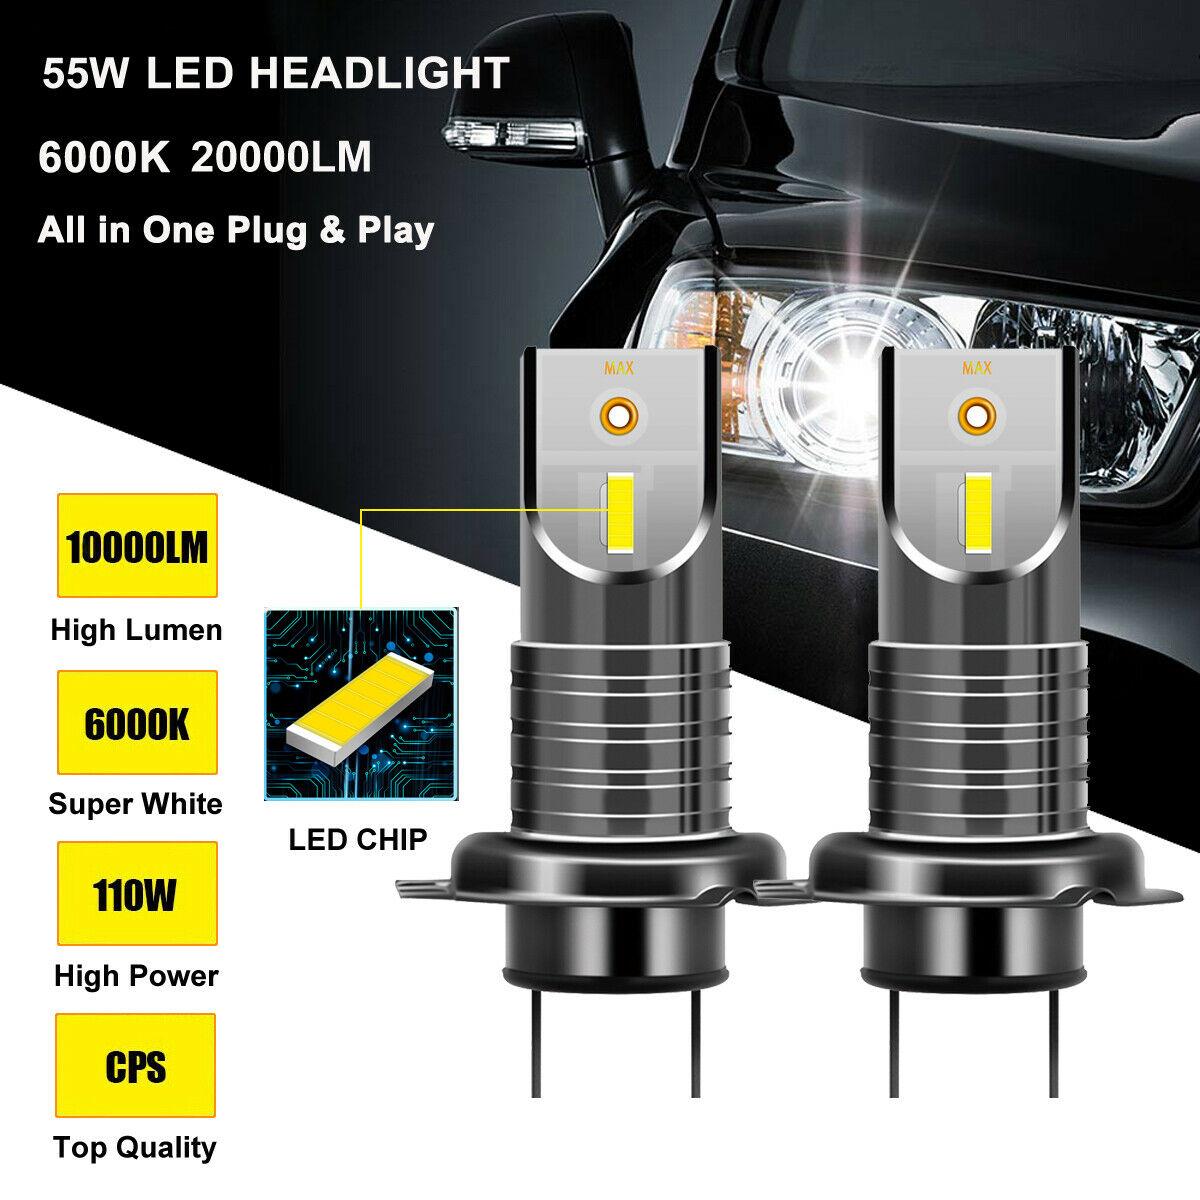 1 Pair H7 110W 5050 CSP LED Headlight Bulb Lamp 20000LM 6000K Waterproof 9V-32V